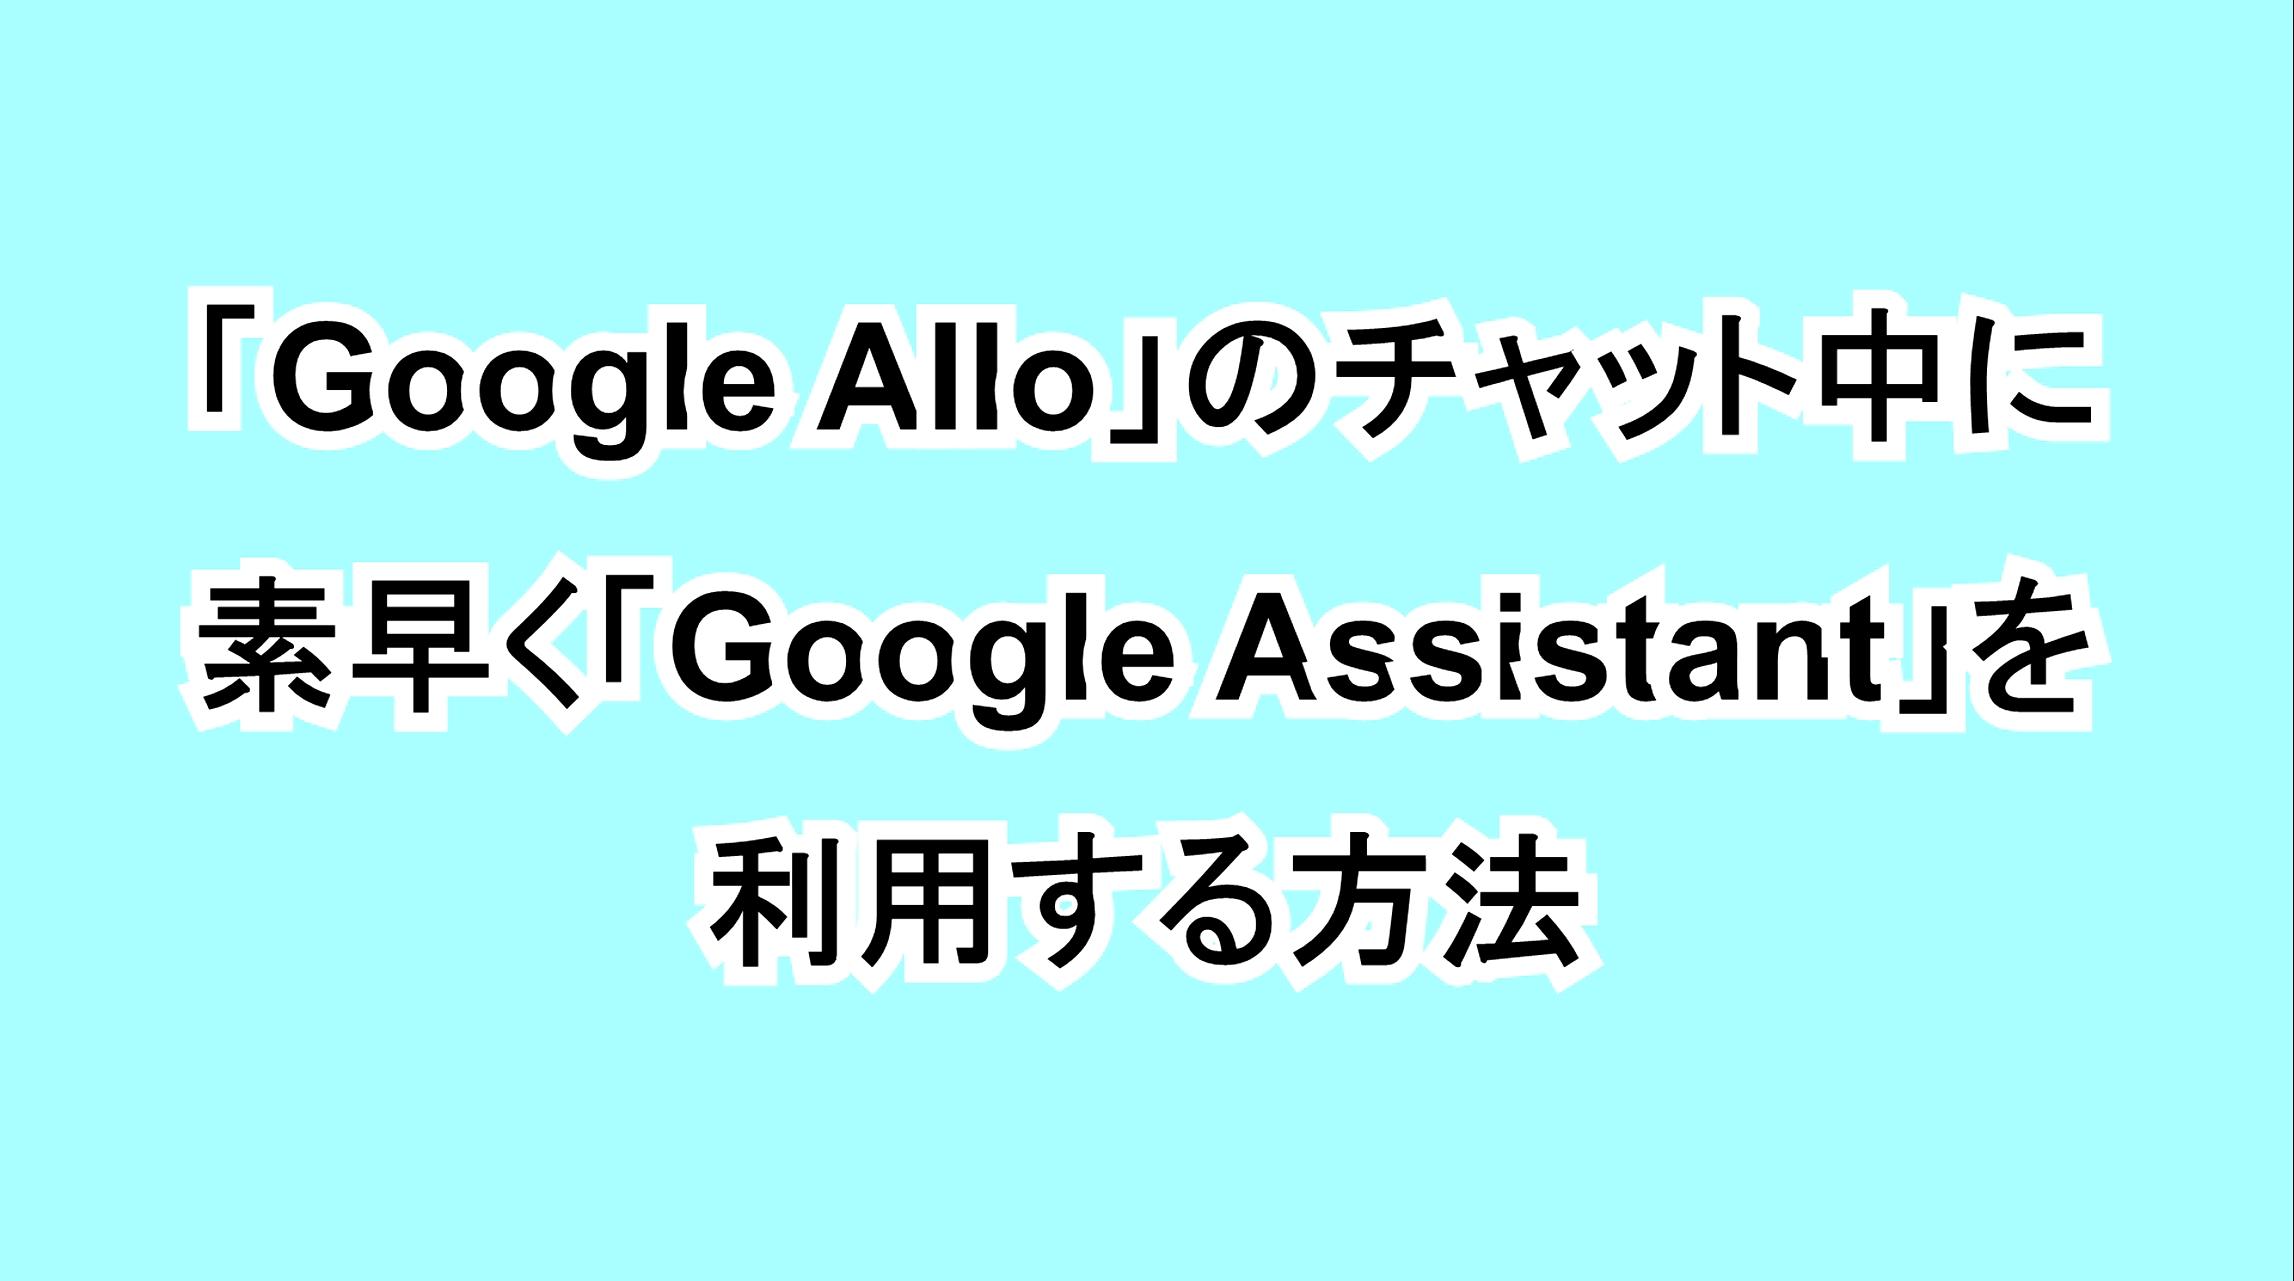 「Google Allo」のチャット中に素早く「Google Assistant」を利用する方法